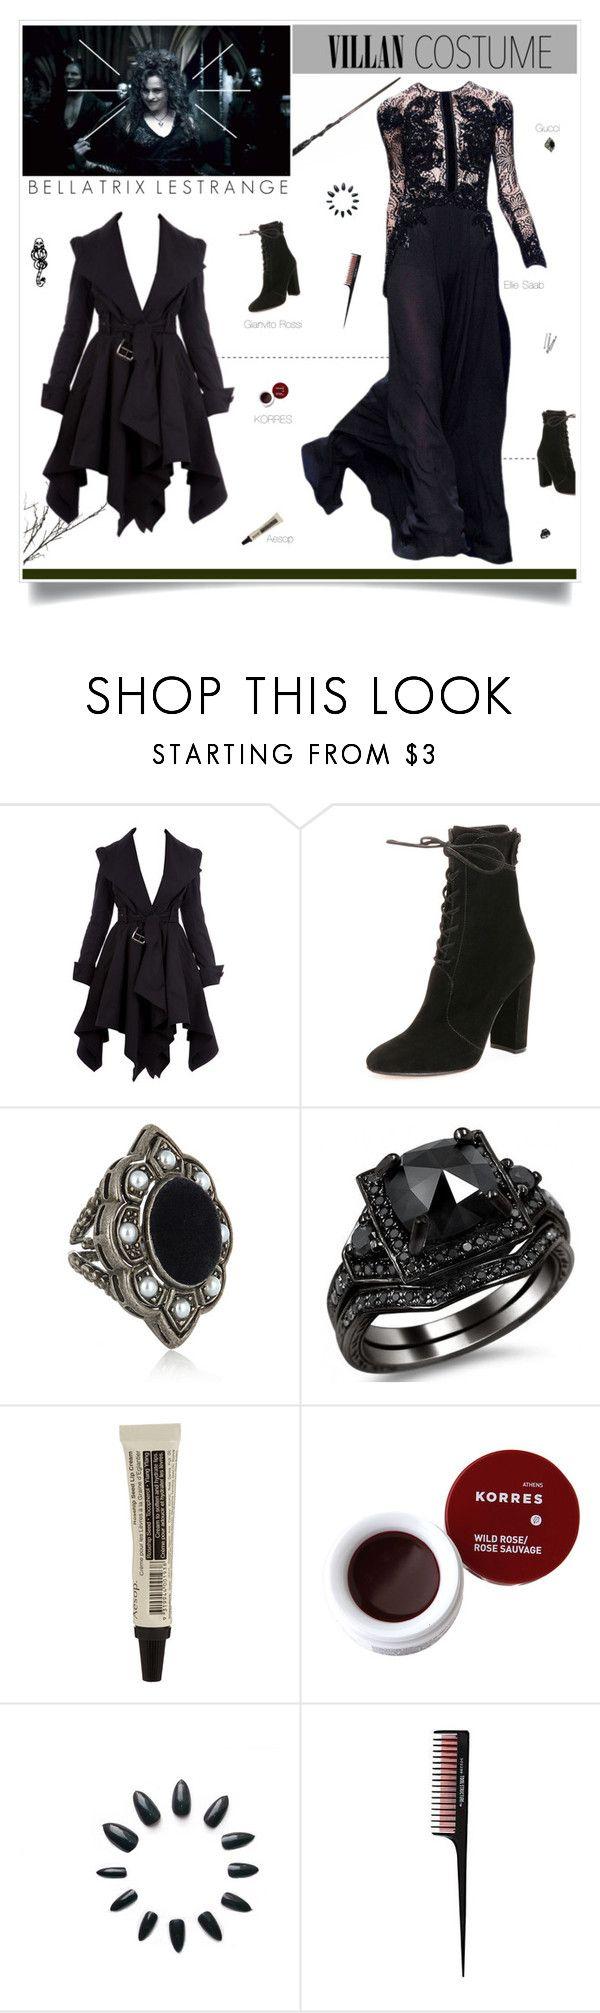 Best 25+ Bellatrix lestrange costume ideas on Pinterest ...